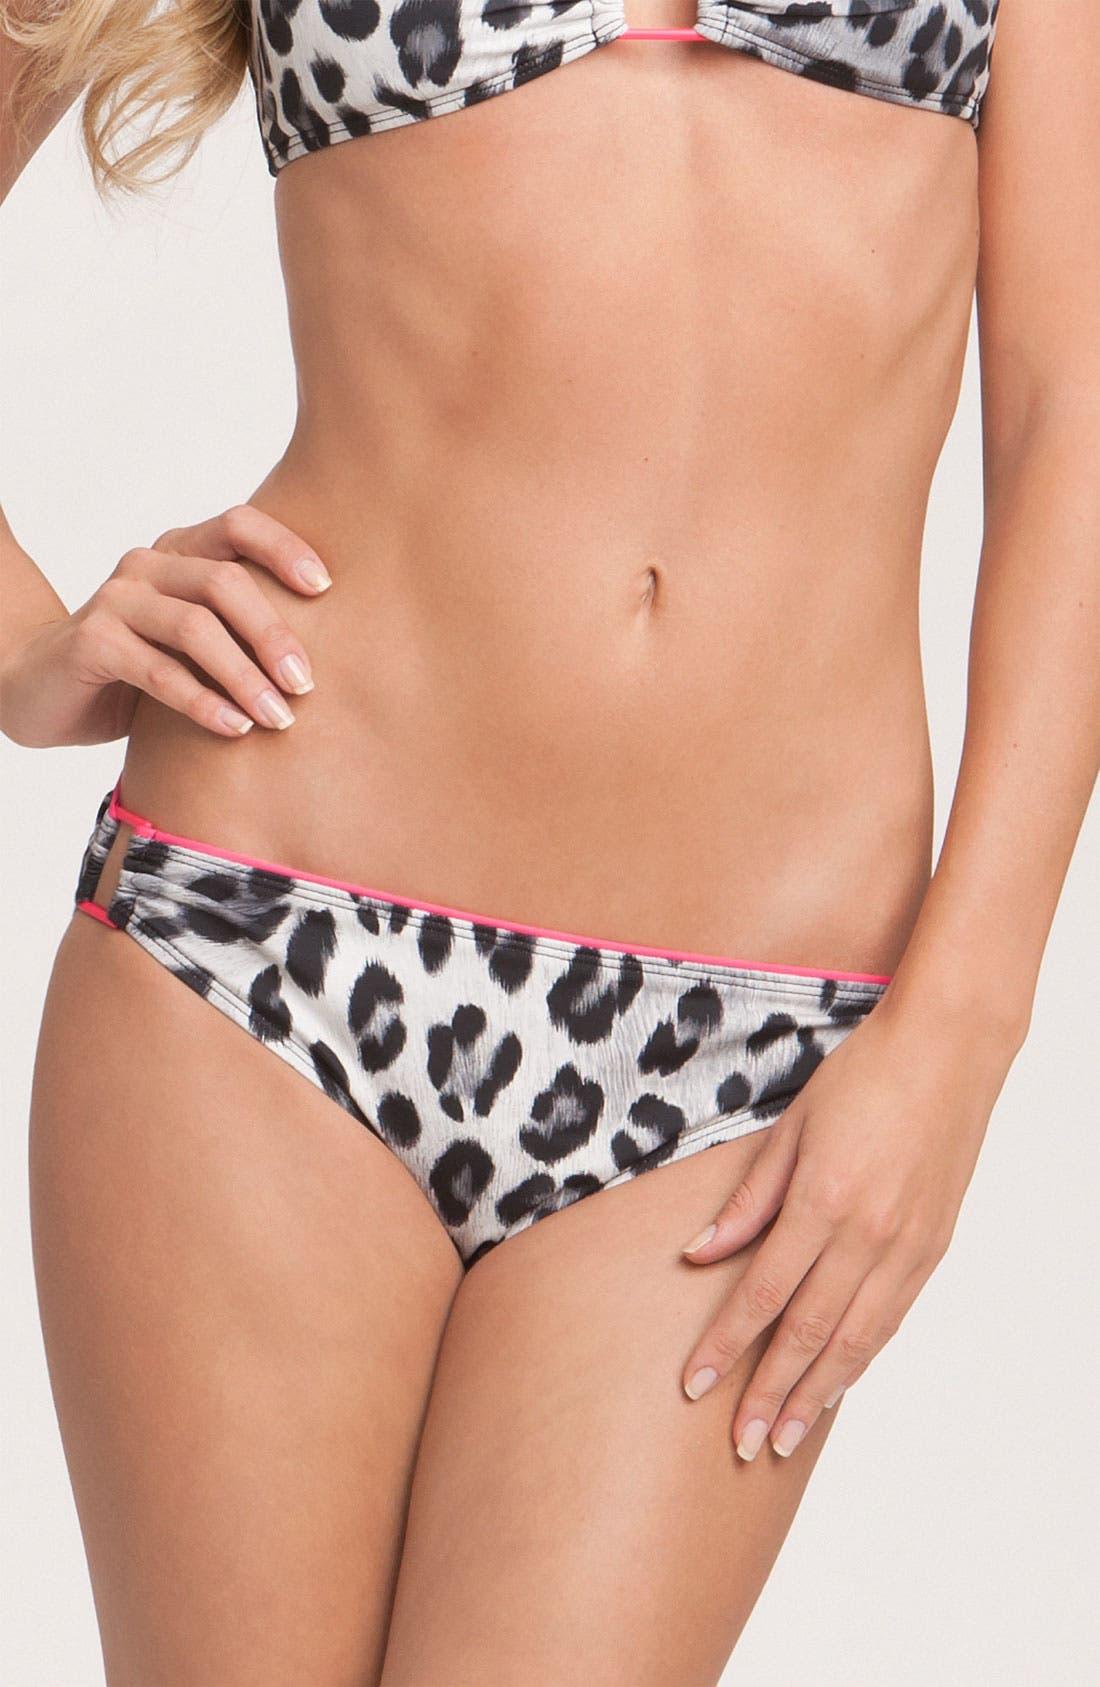 Alternate Image 1 Selected - Vince Camuto 'Wild Cheetah' Bikini Bottoms